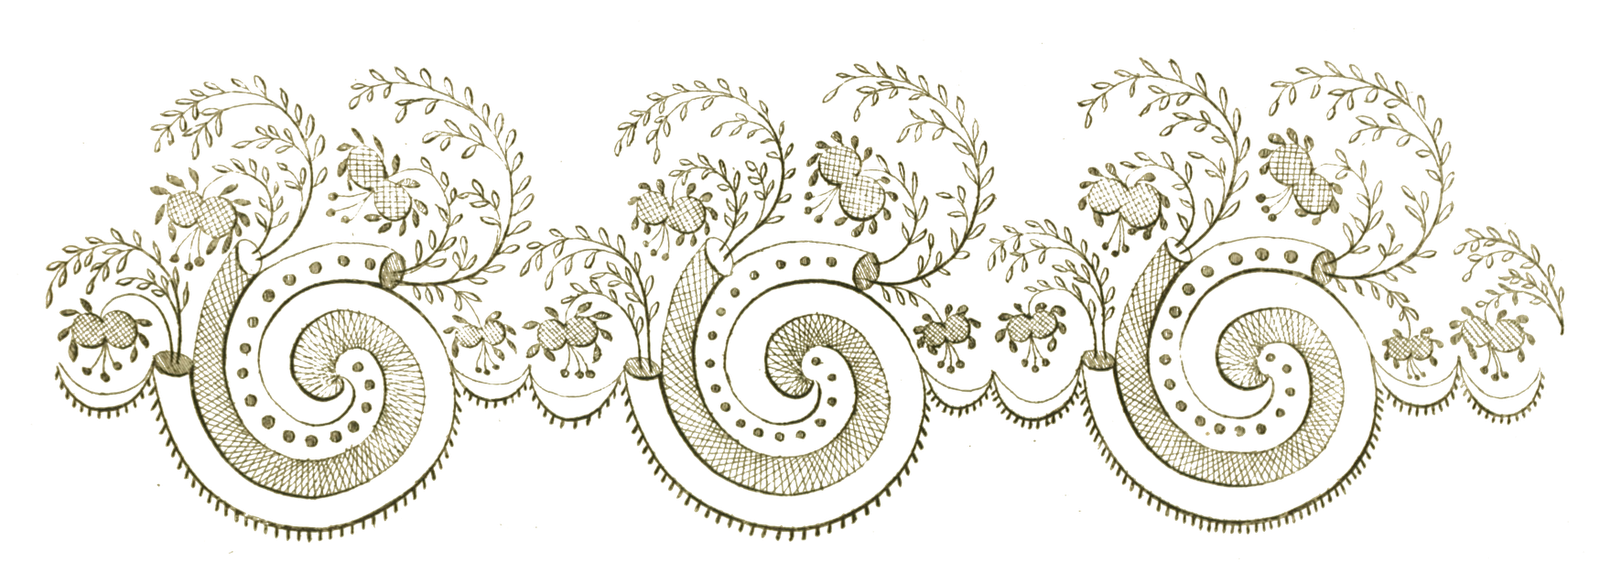 [Image: 1816+Needlework+Pattern+-++Sept+1816.png]